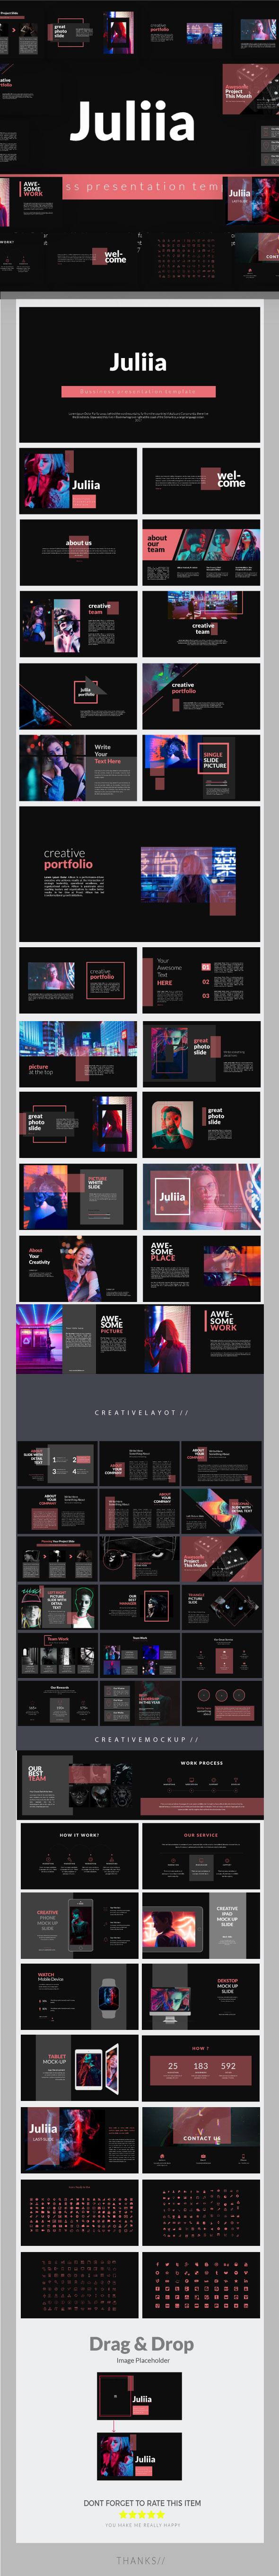 GraphicRiver Juliia Googleslide Presentation Templates 21136485